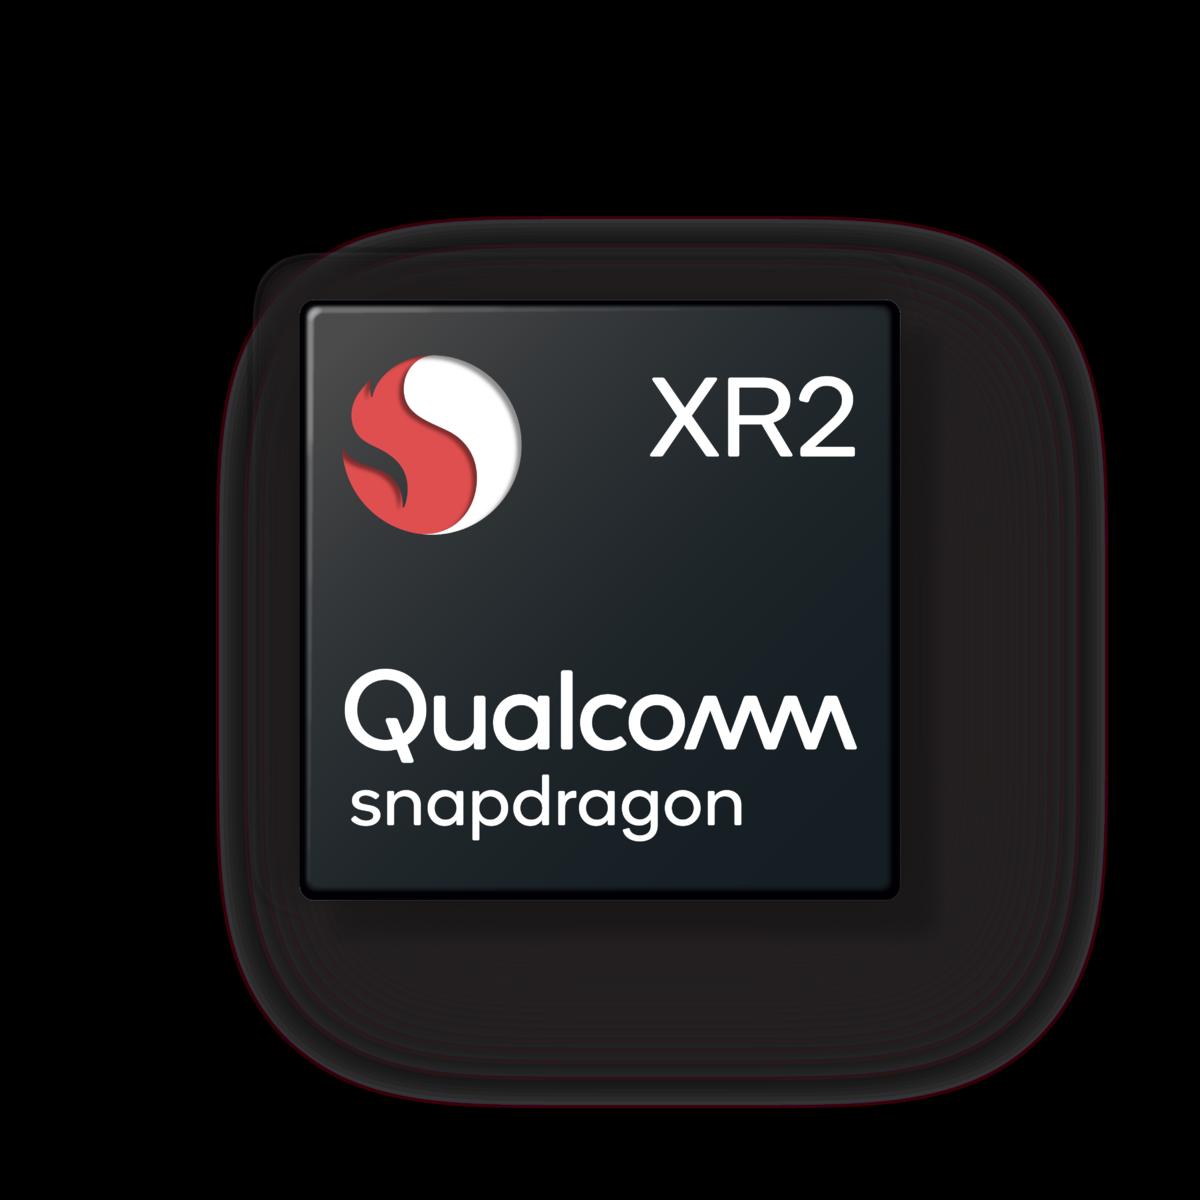 Oculus Quest 2 发布:首次商用高通骁龙 XR2 平台 - 热点资讯 家电百科 第2张